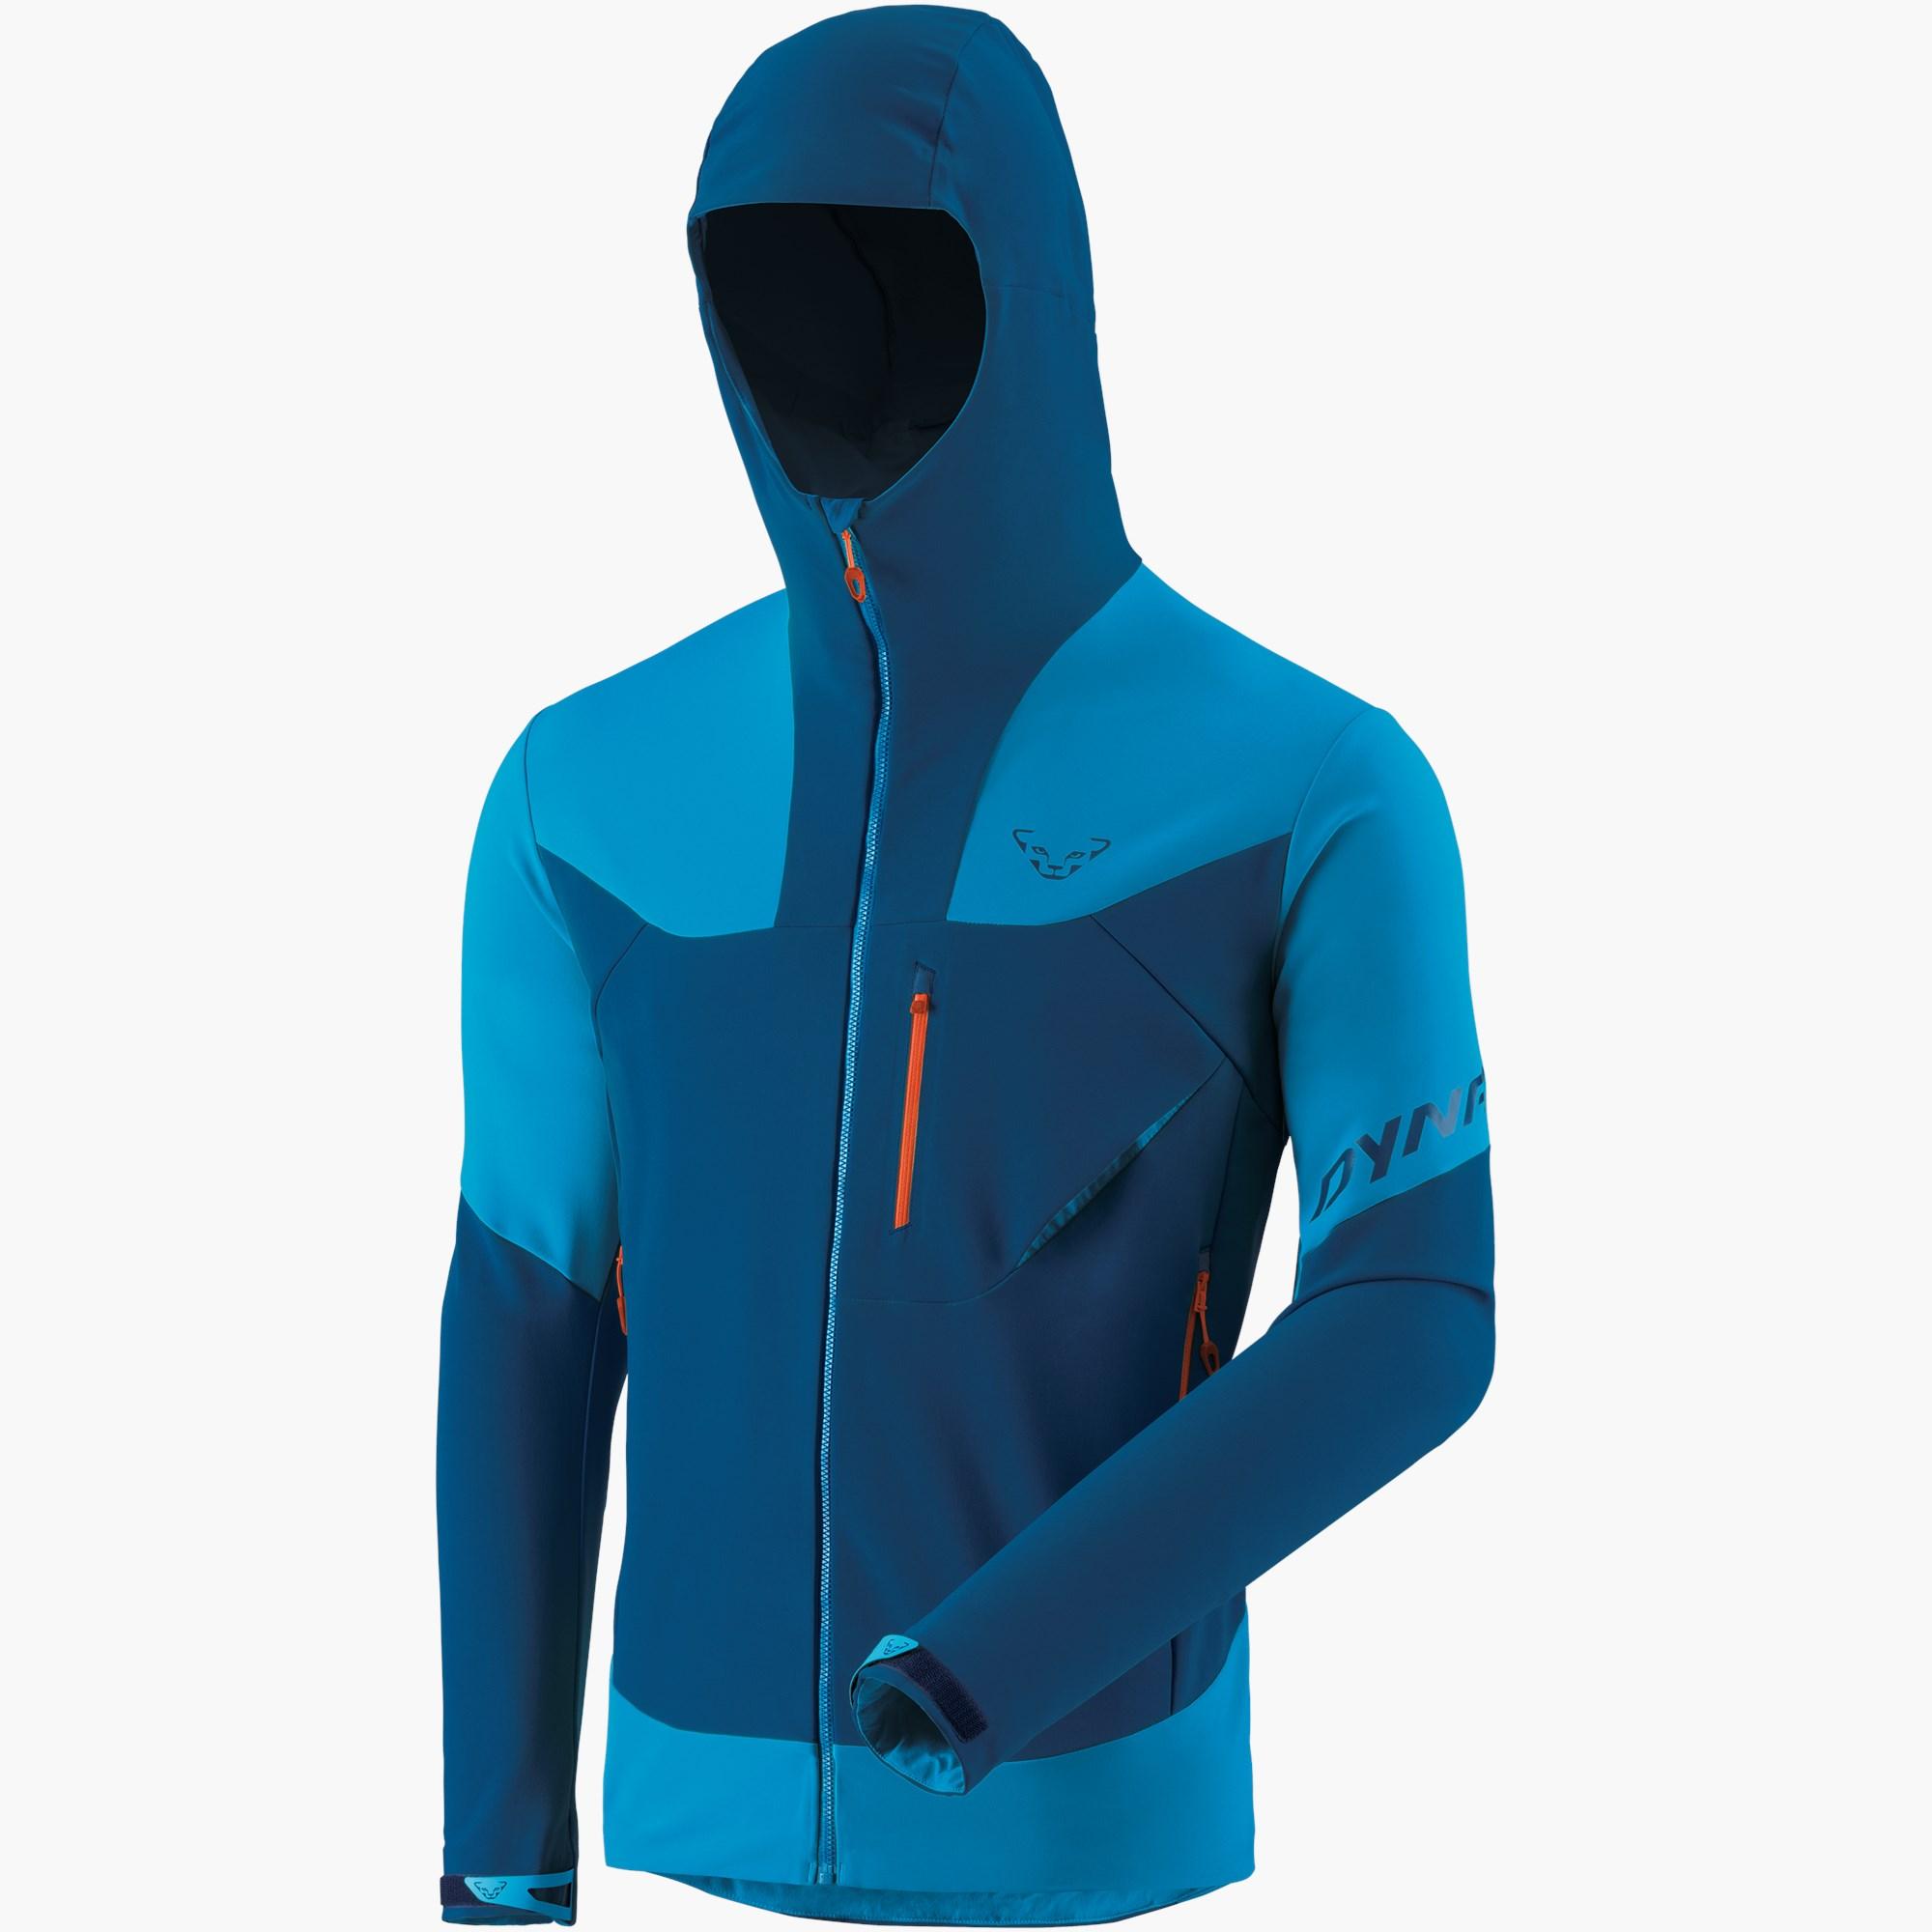 Softshell jacket men's ski touring and trail running | Dynafit